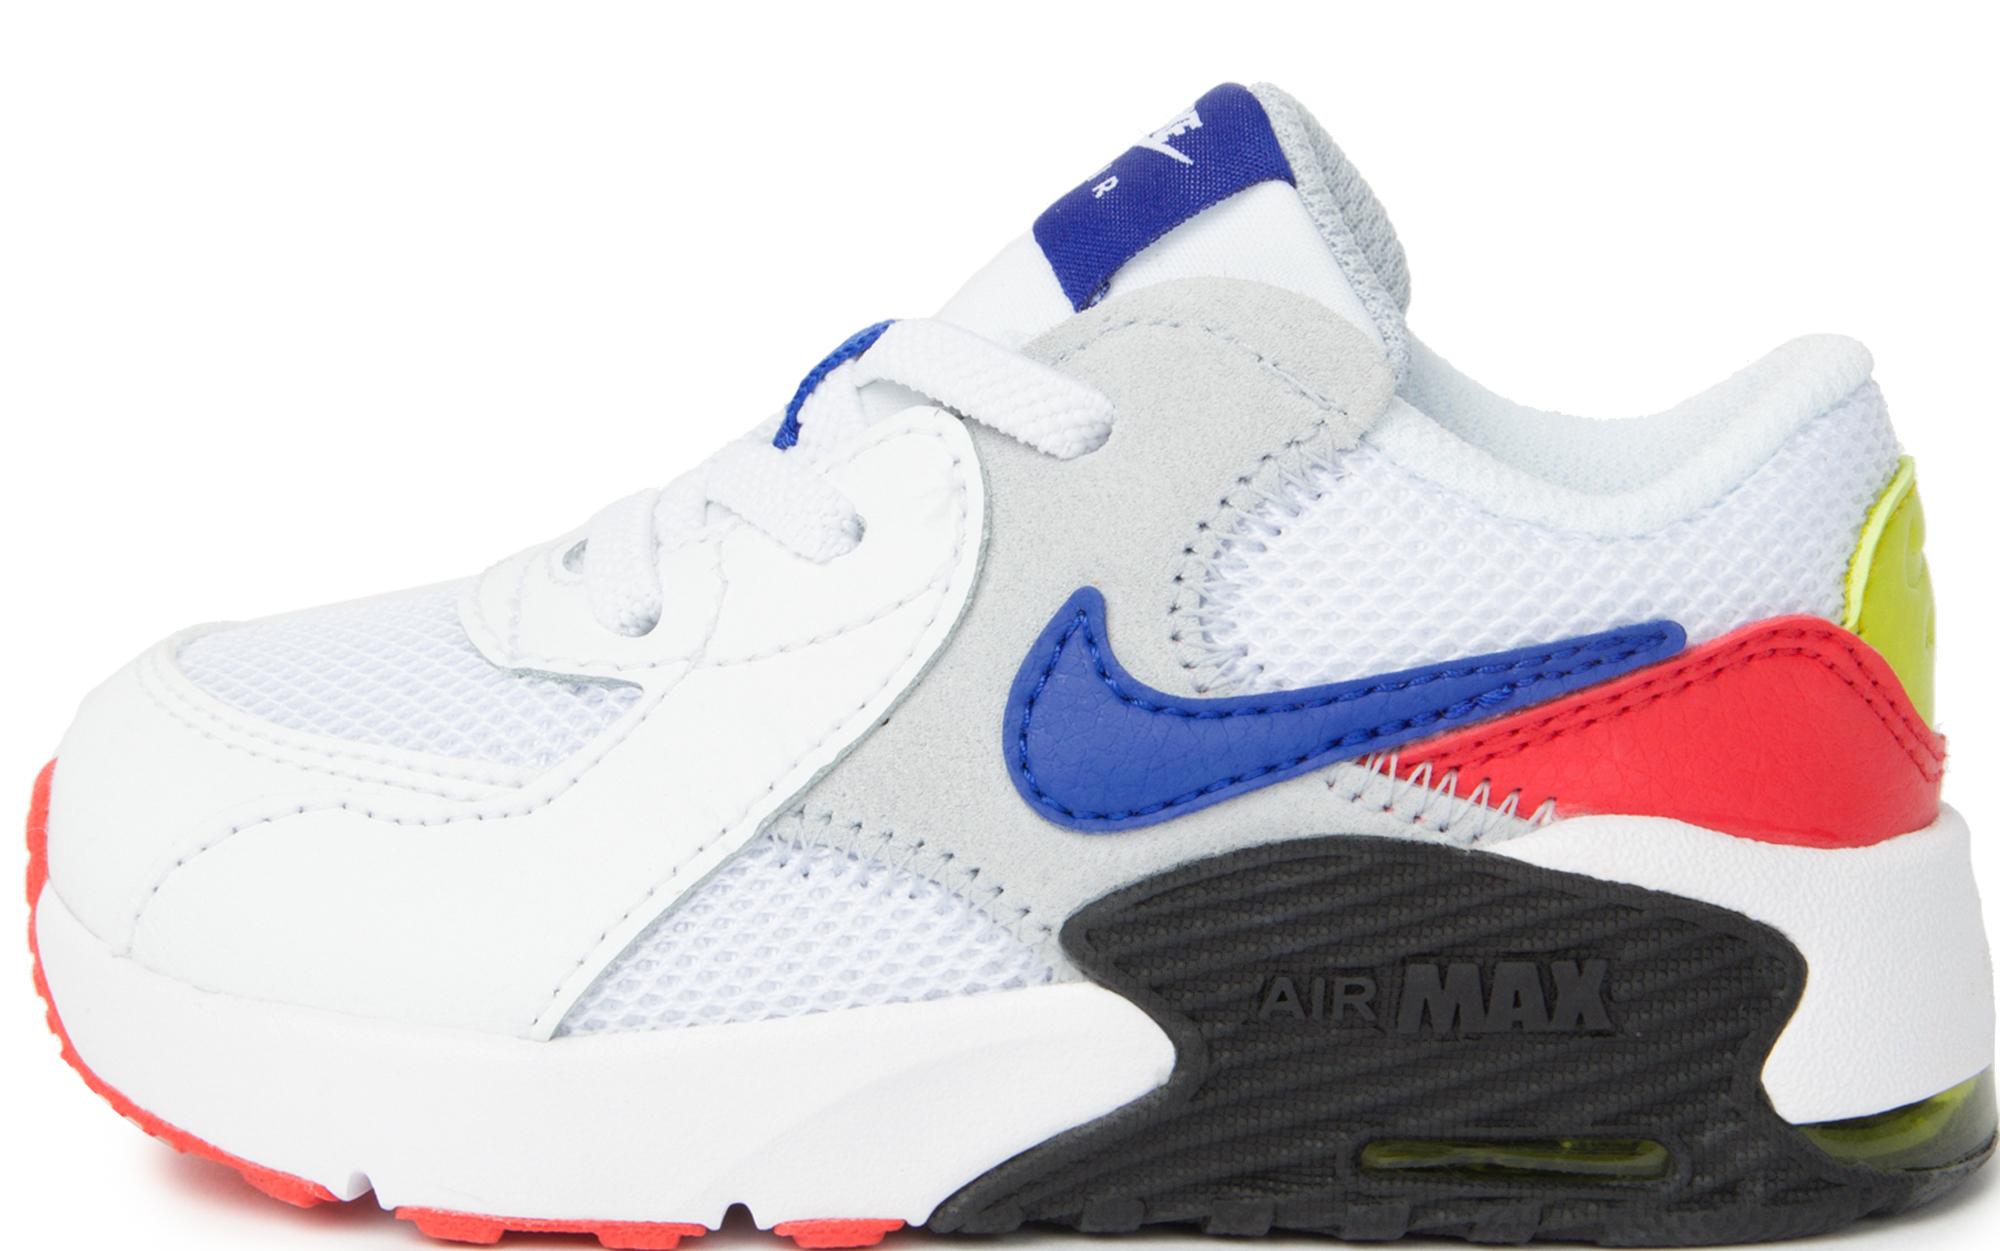 Nike Кроссовки для мальчиков Nike Air Max Excee, размер 26